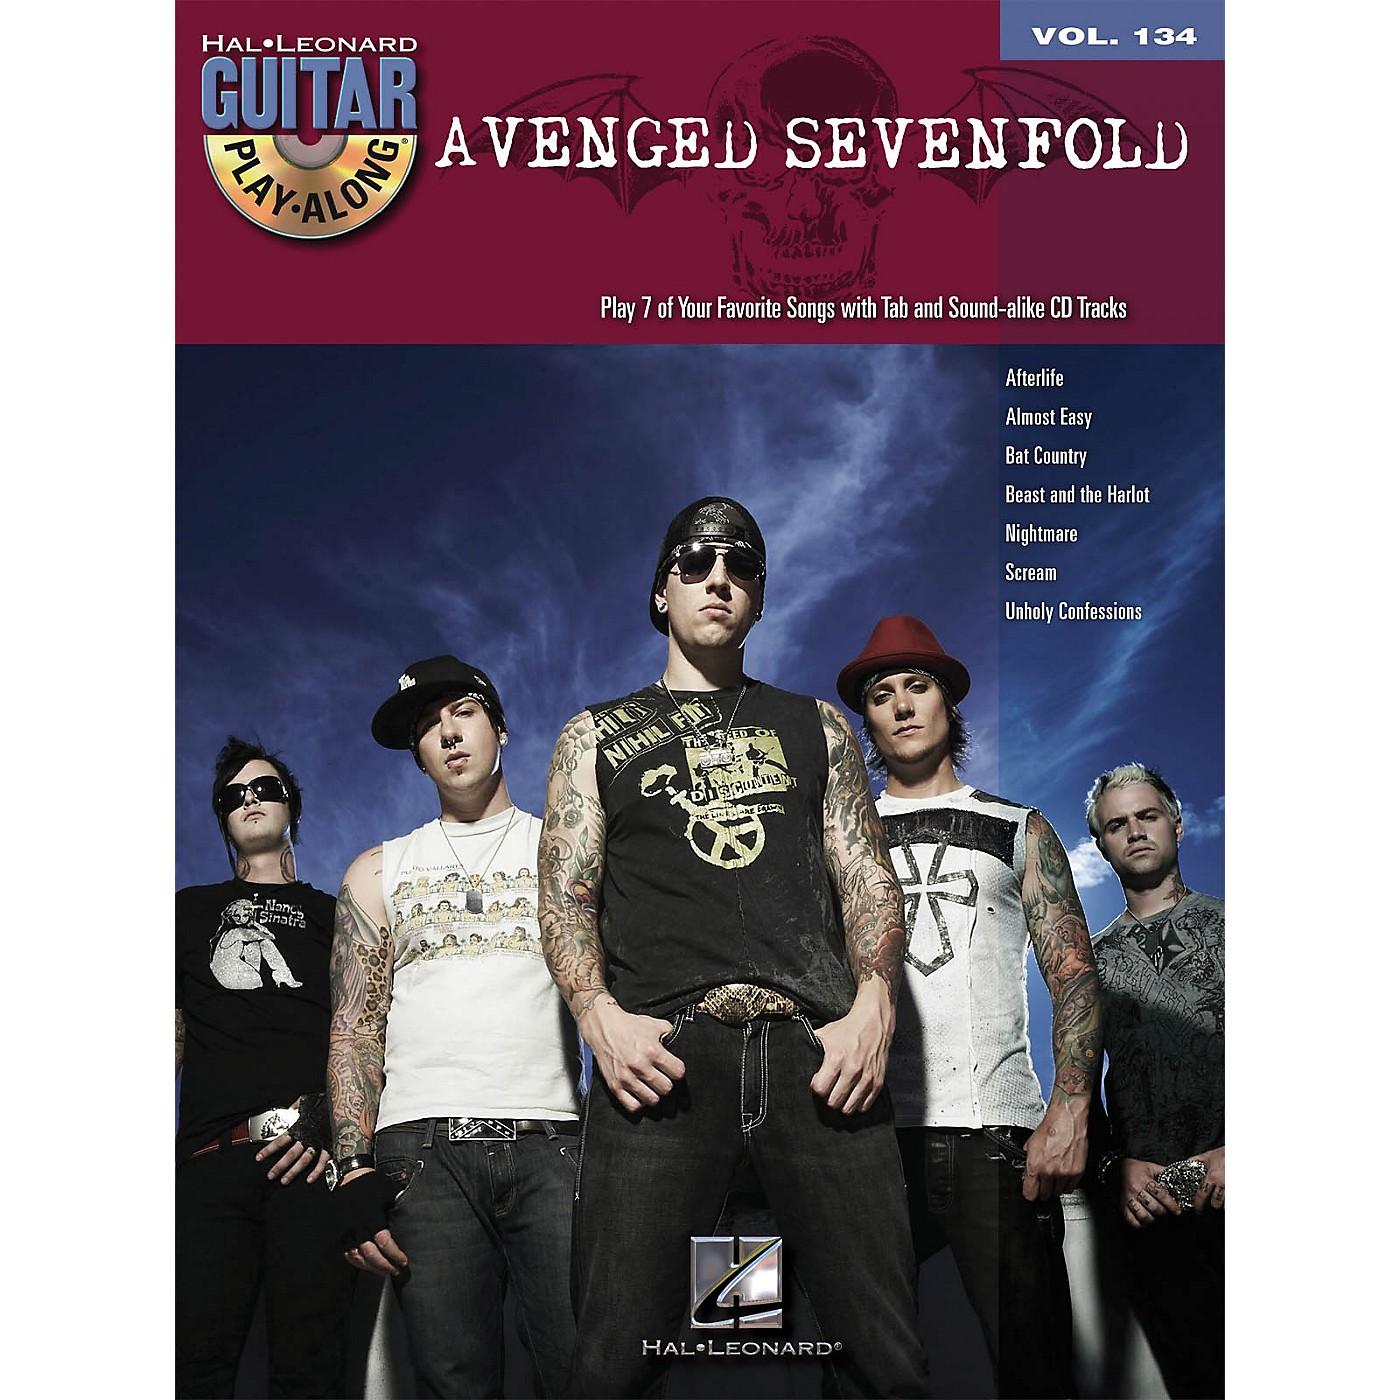 Hal Leonard Avenged Sevenfold - Guitar Play-Along Volume 134 (Book/CD) thumbnail